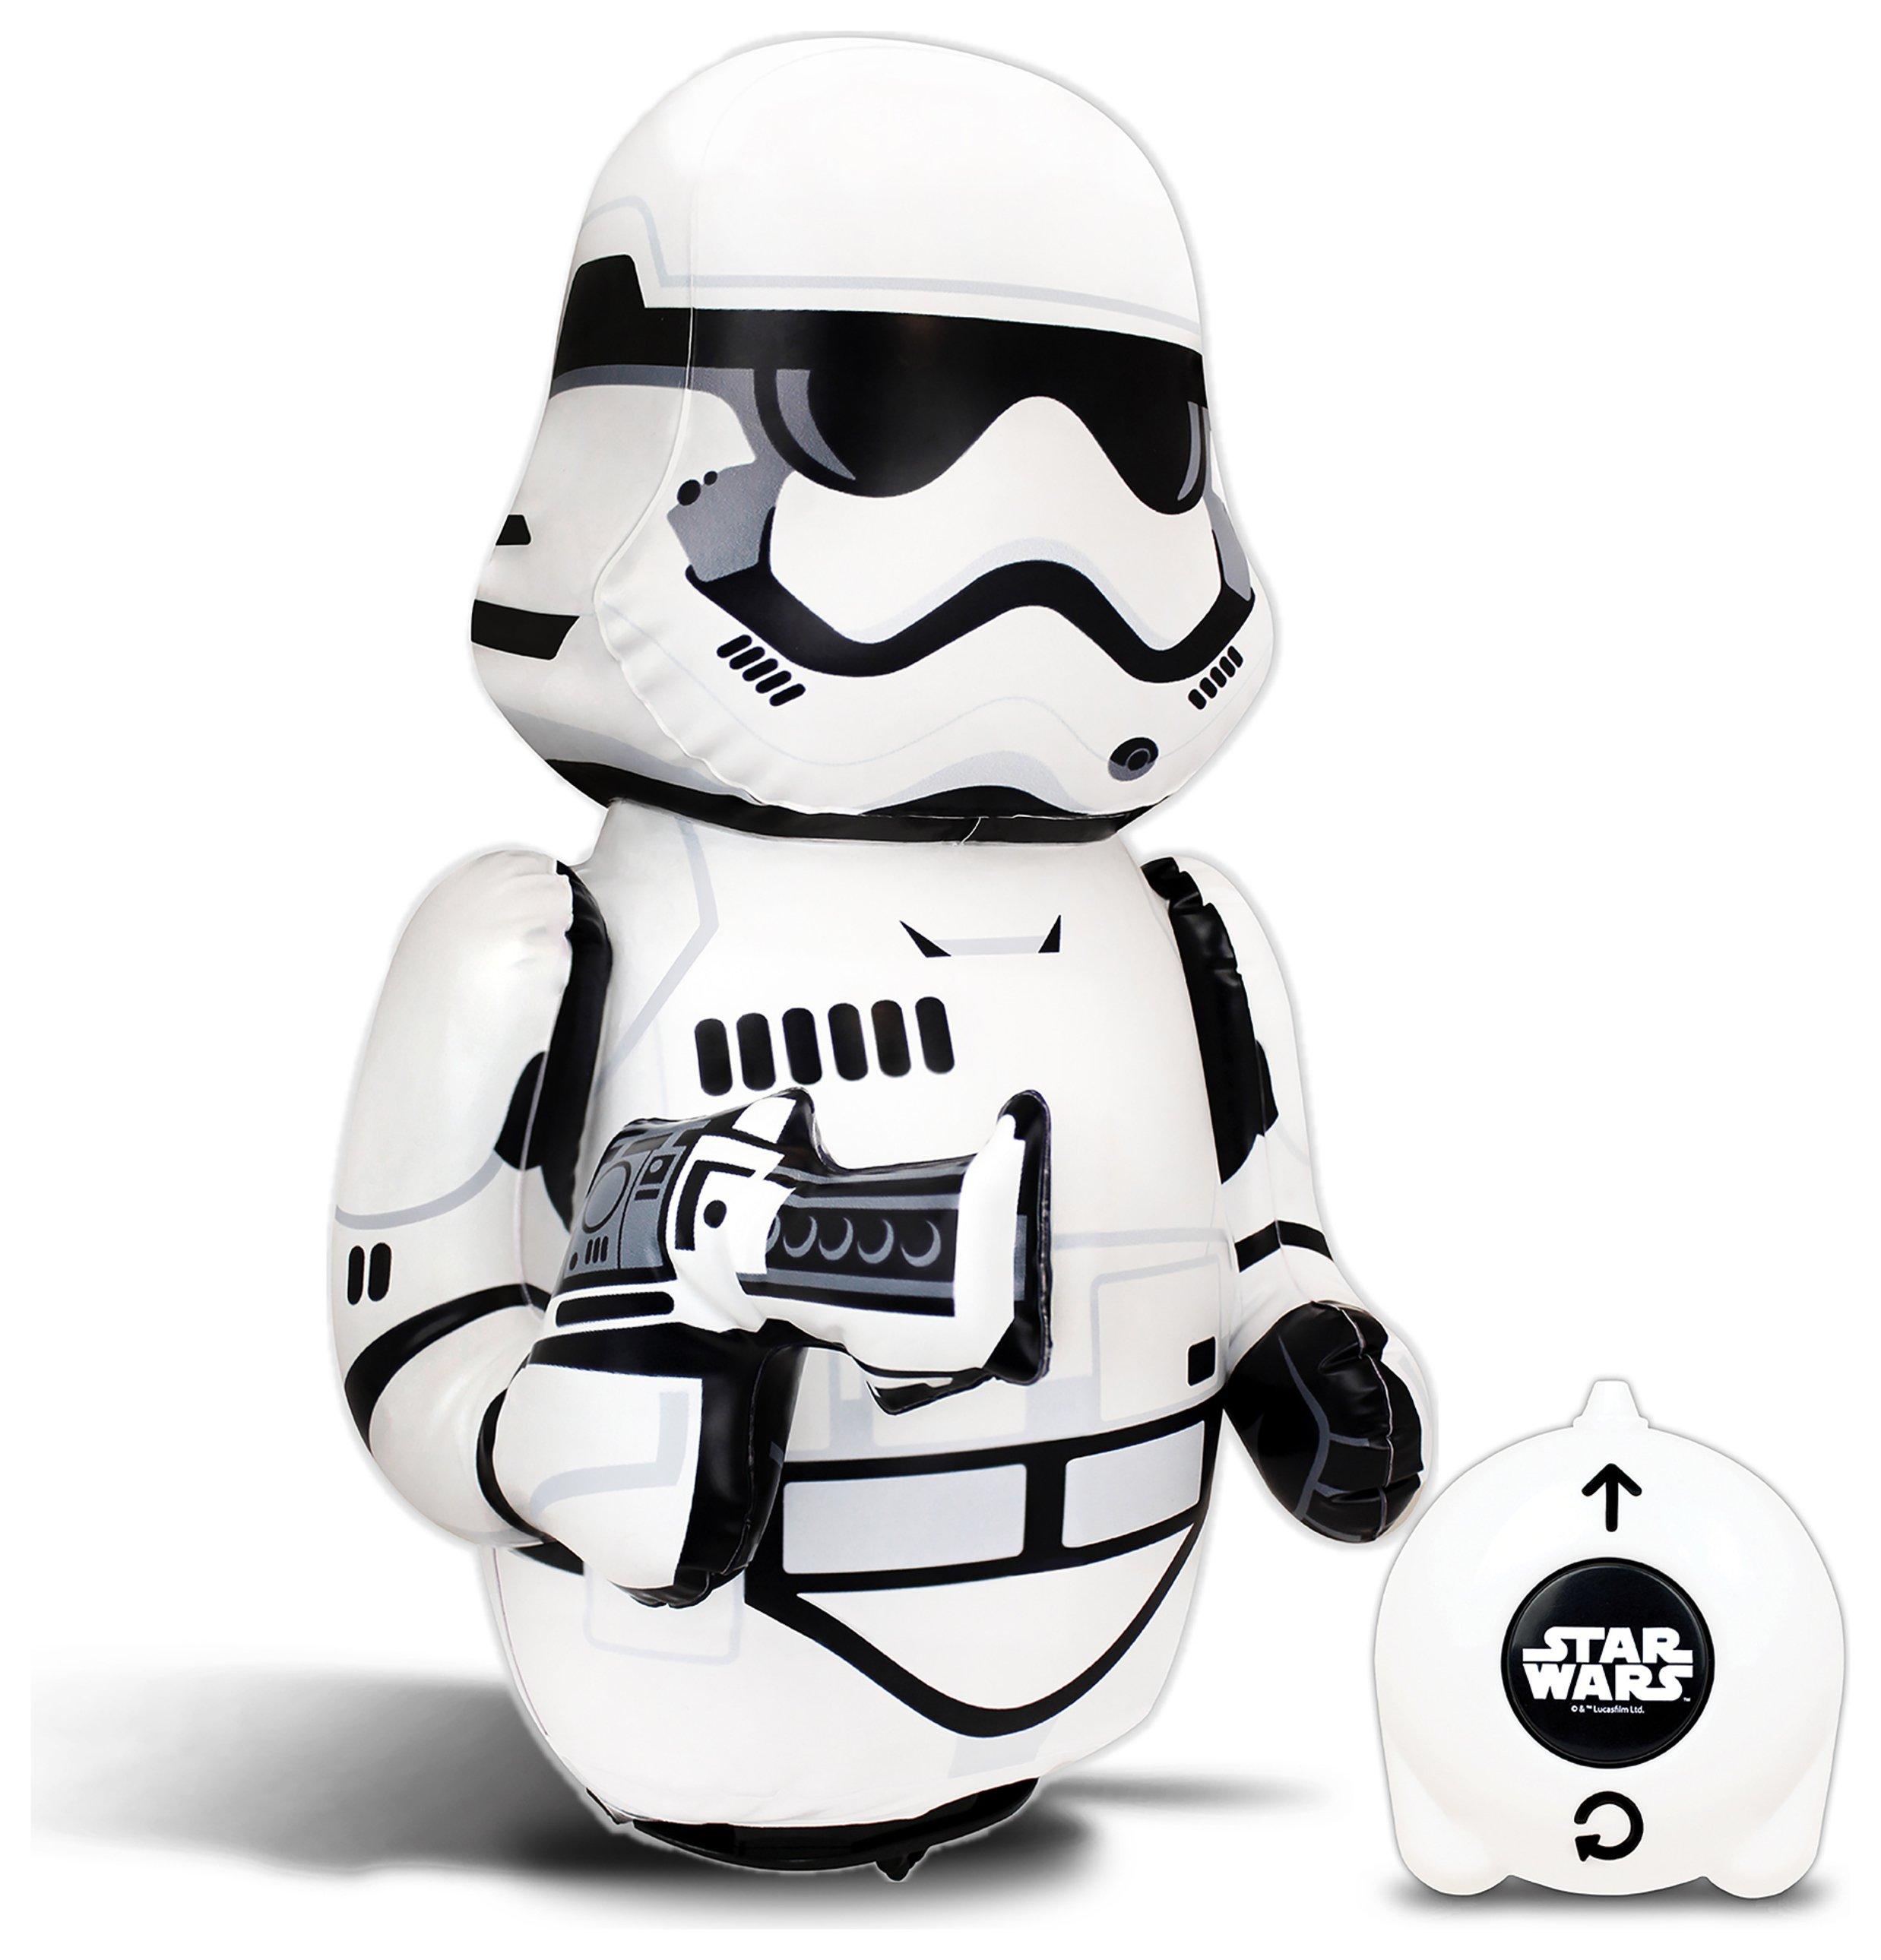 stars-wars-rc-inflatable-stormtrooper-jumbo